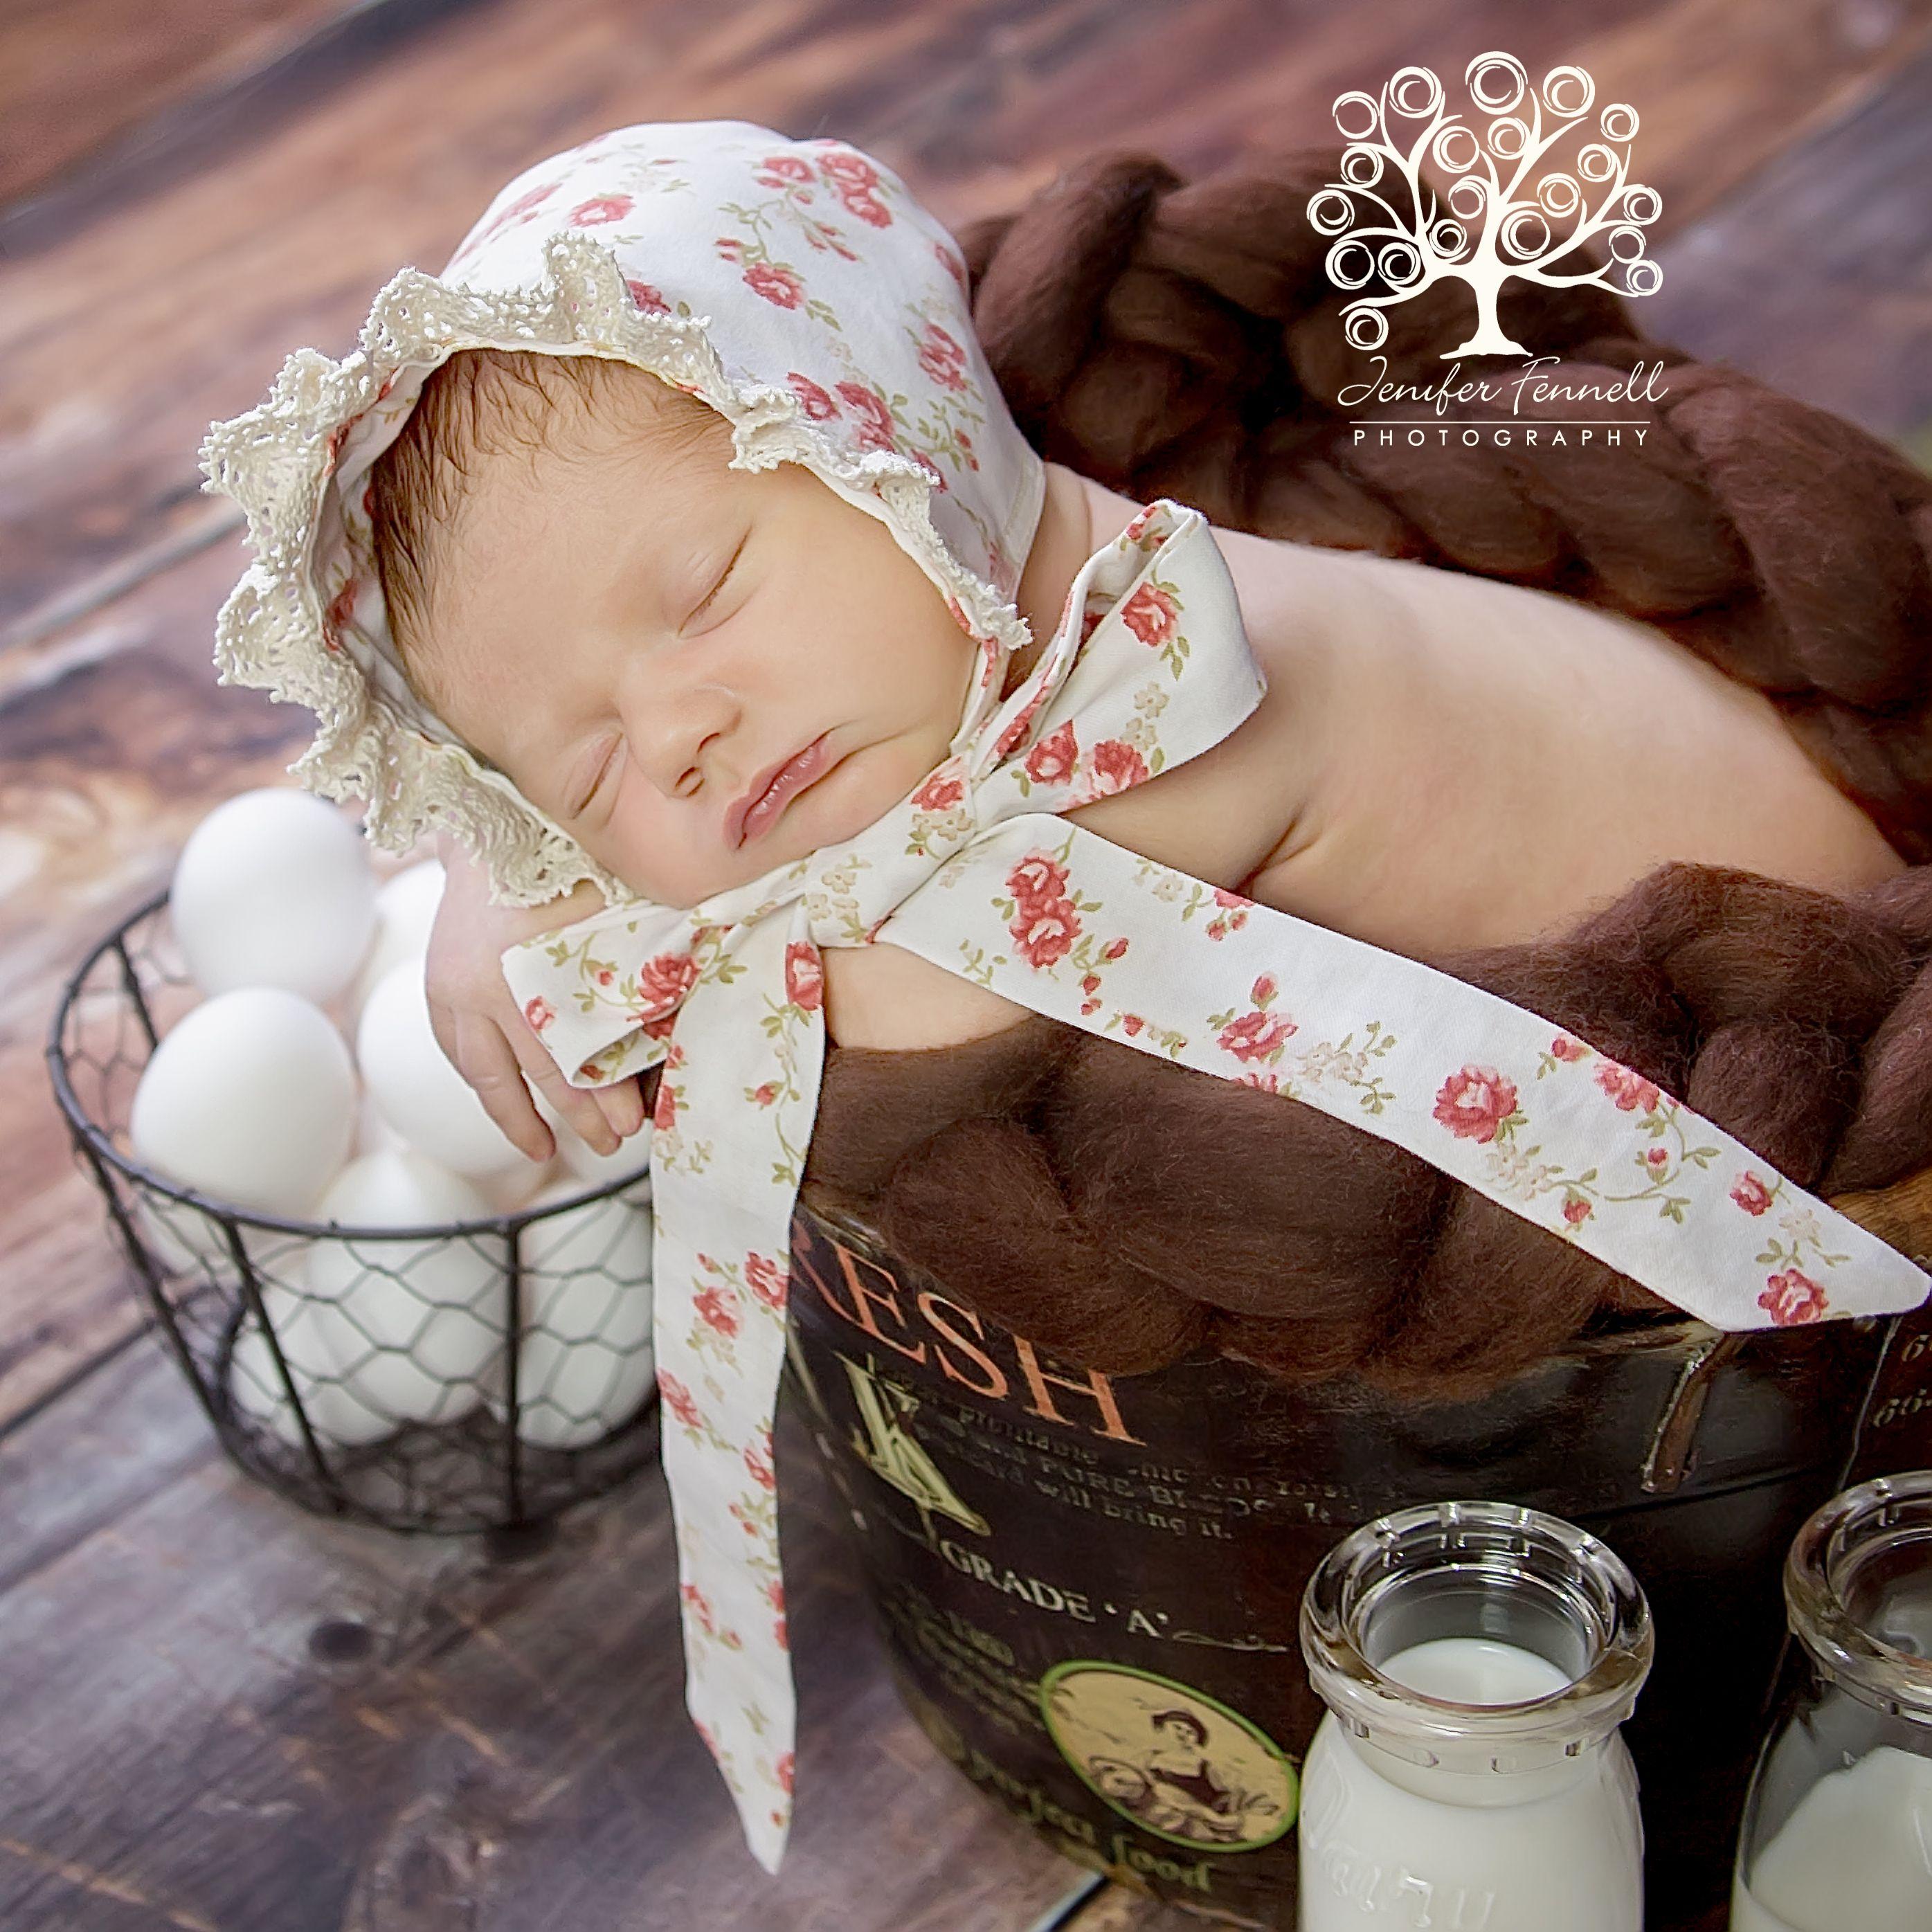 Amazing Blessings Newborn Session | Baby Madison  | Copyright @ www.photographybyjenifer.com |  Jenifer Fennell Photography https://www.facebook.com/photo.php?fbid=10151329230531646&set=pb.240224131645.-2207520000.1388085438.&type=3&theater